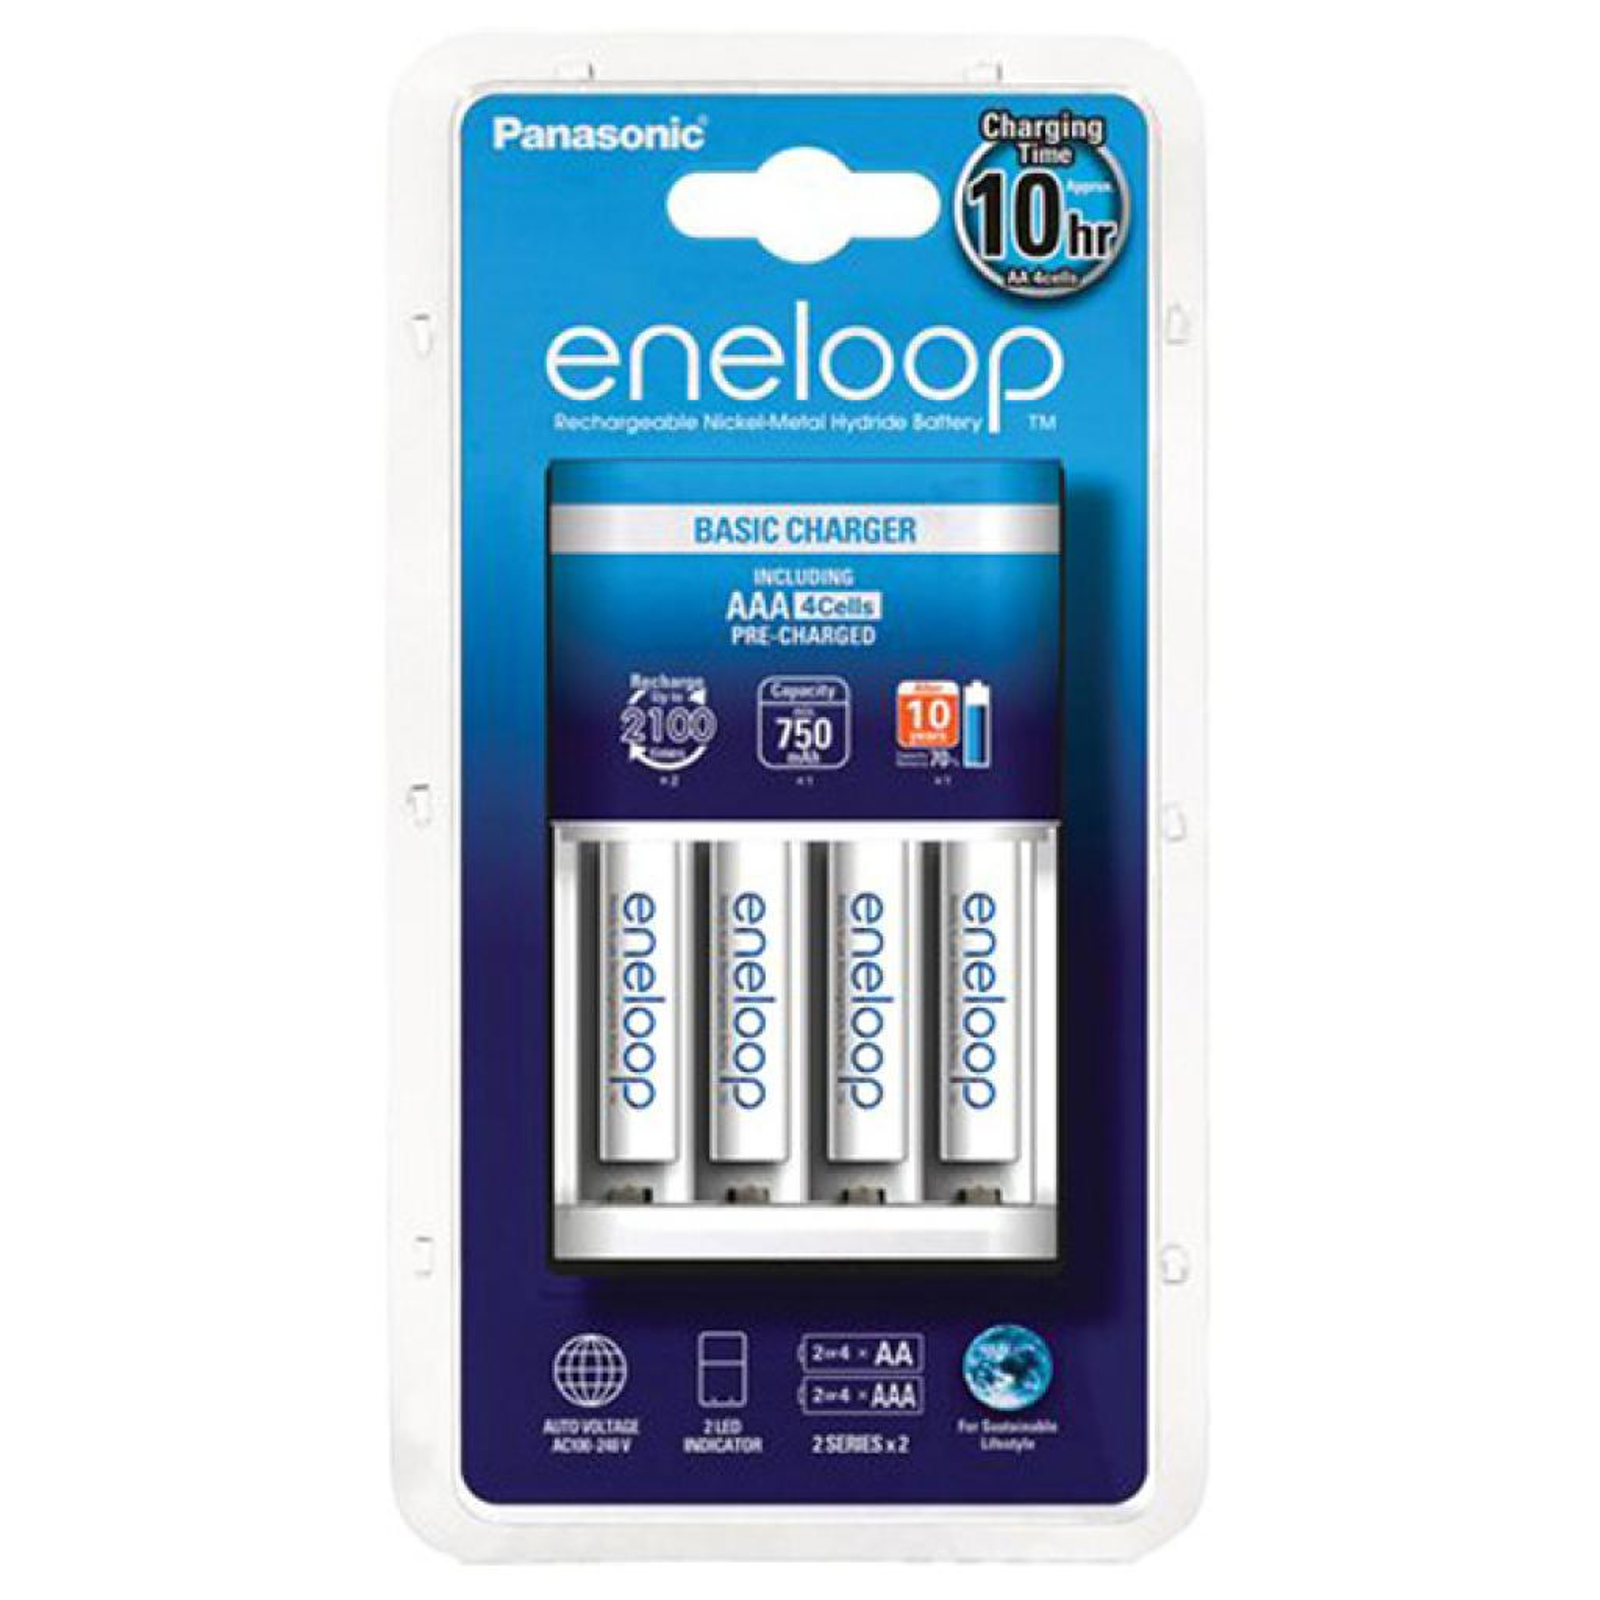 Зарядное устройство для аккумуляторов PANASONIC Basic Charger New + Eneloop 4AAA 750 mAh NI-MH (K-KJ51MCC04E)